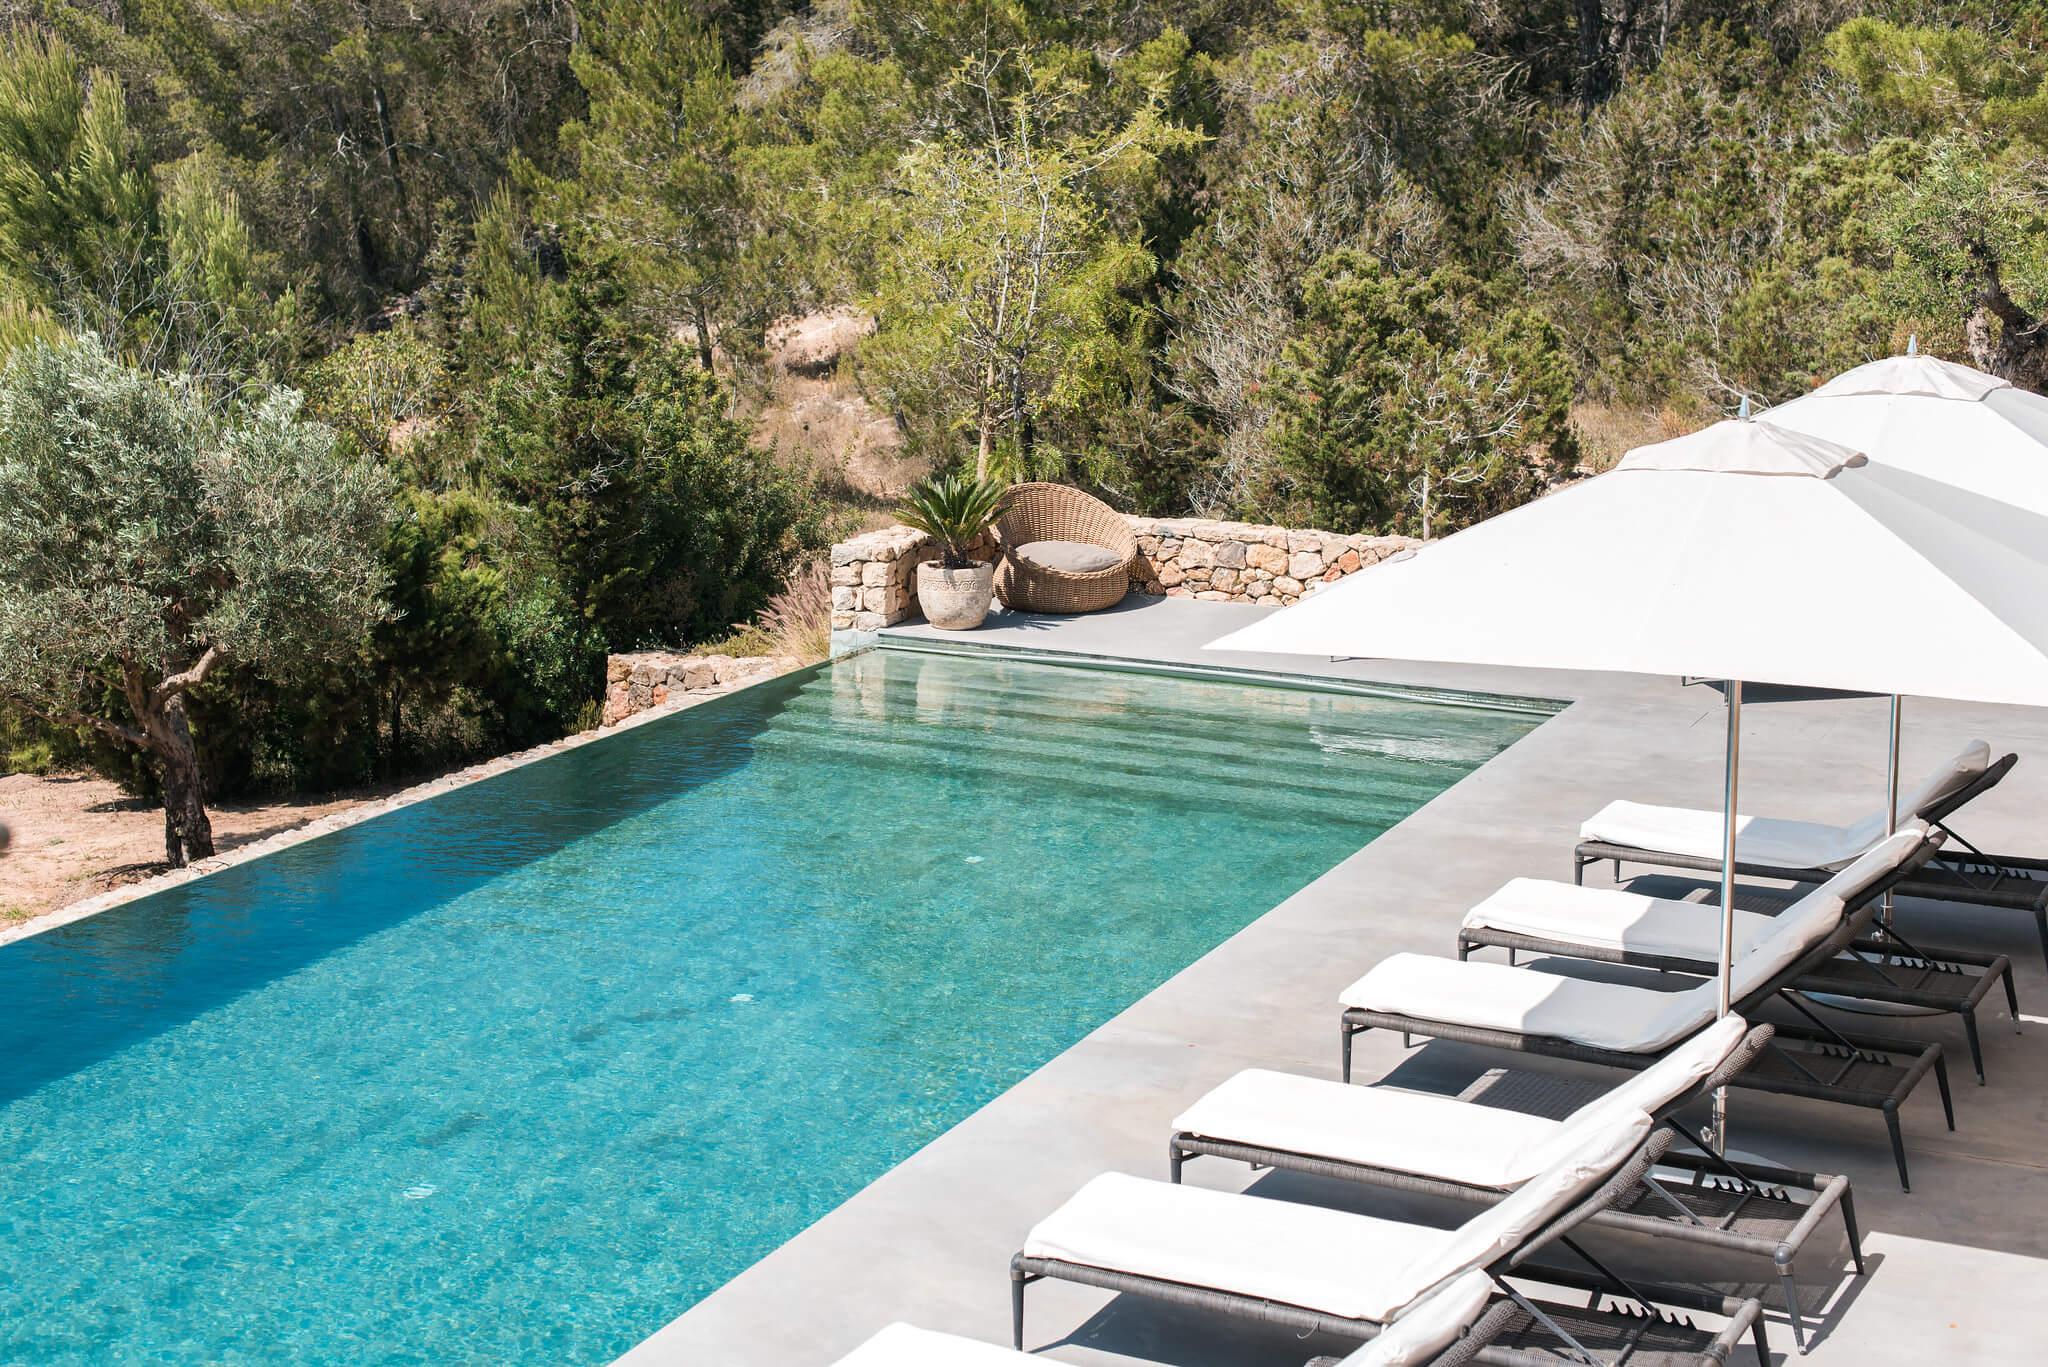 https://www.white-ibiza.com/wp-content/uploads/2020/05/white-ibiza-villas-can-zama-pool-from-lawn-copy.jpg